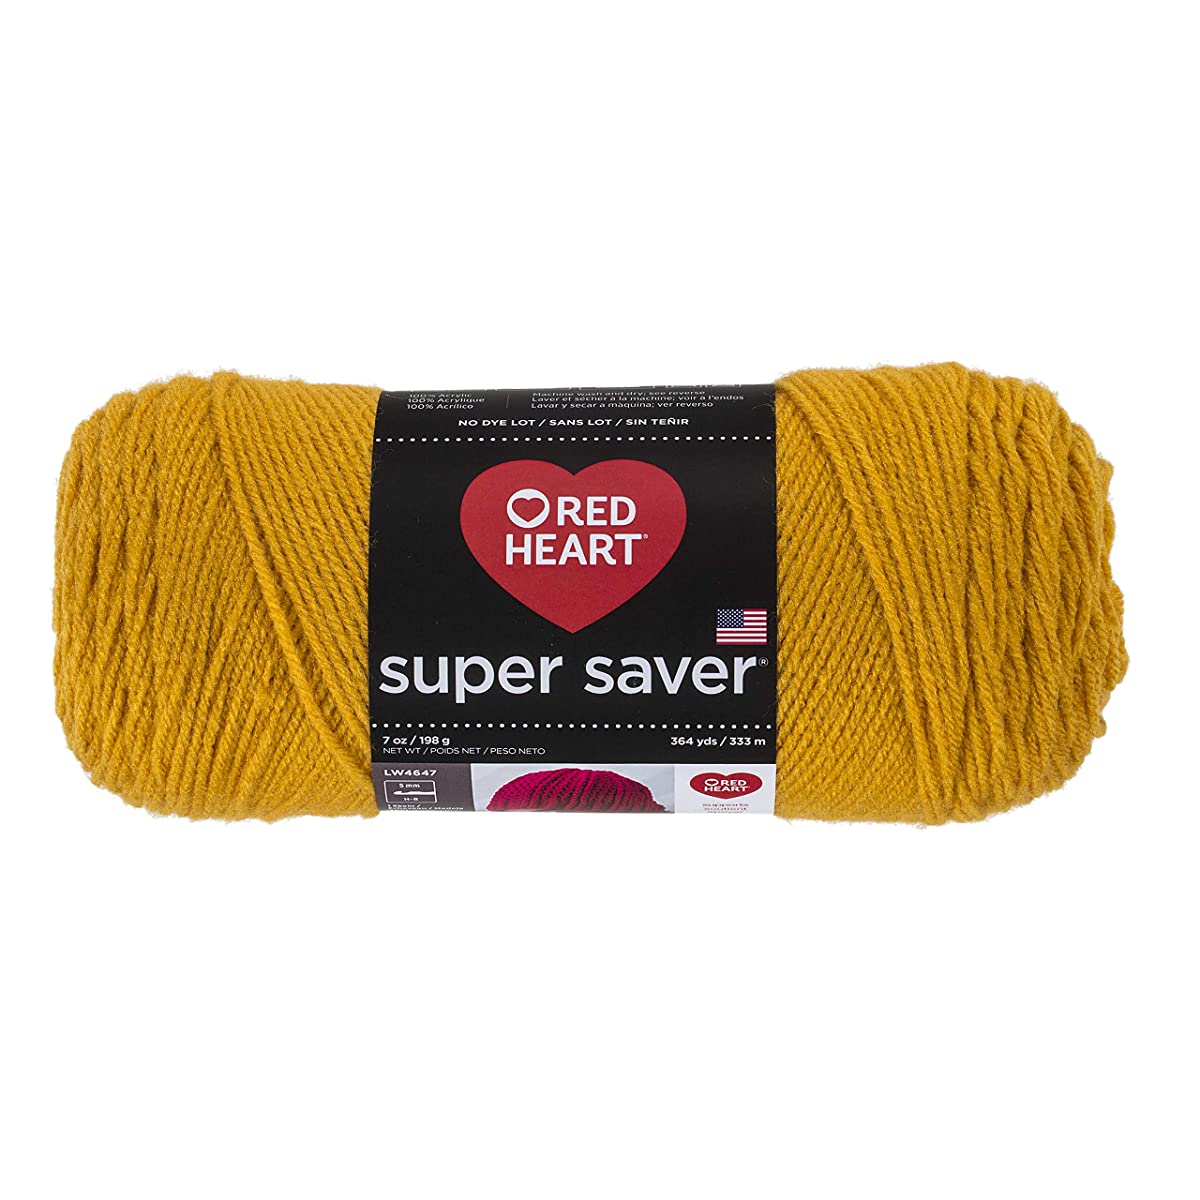 RED HEART Super Saver Yarn, Gold